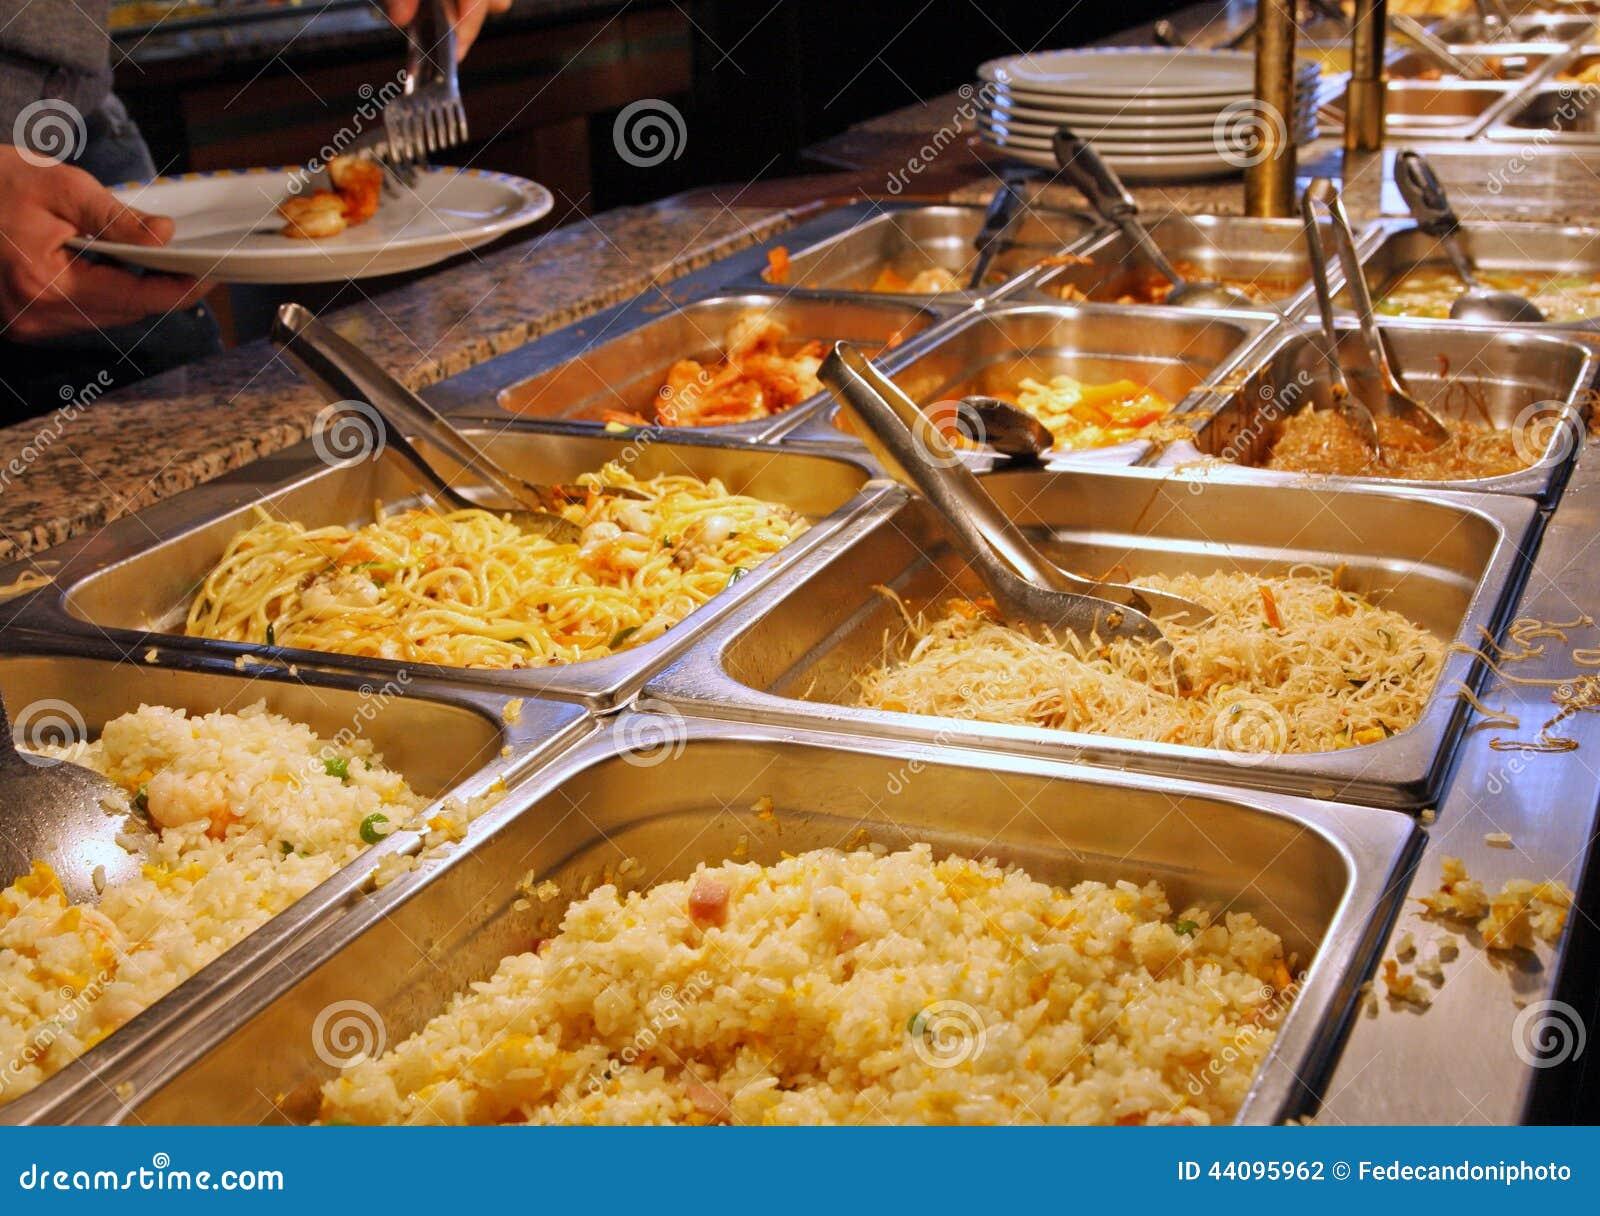 Food Service Trays Deep